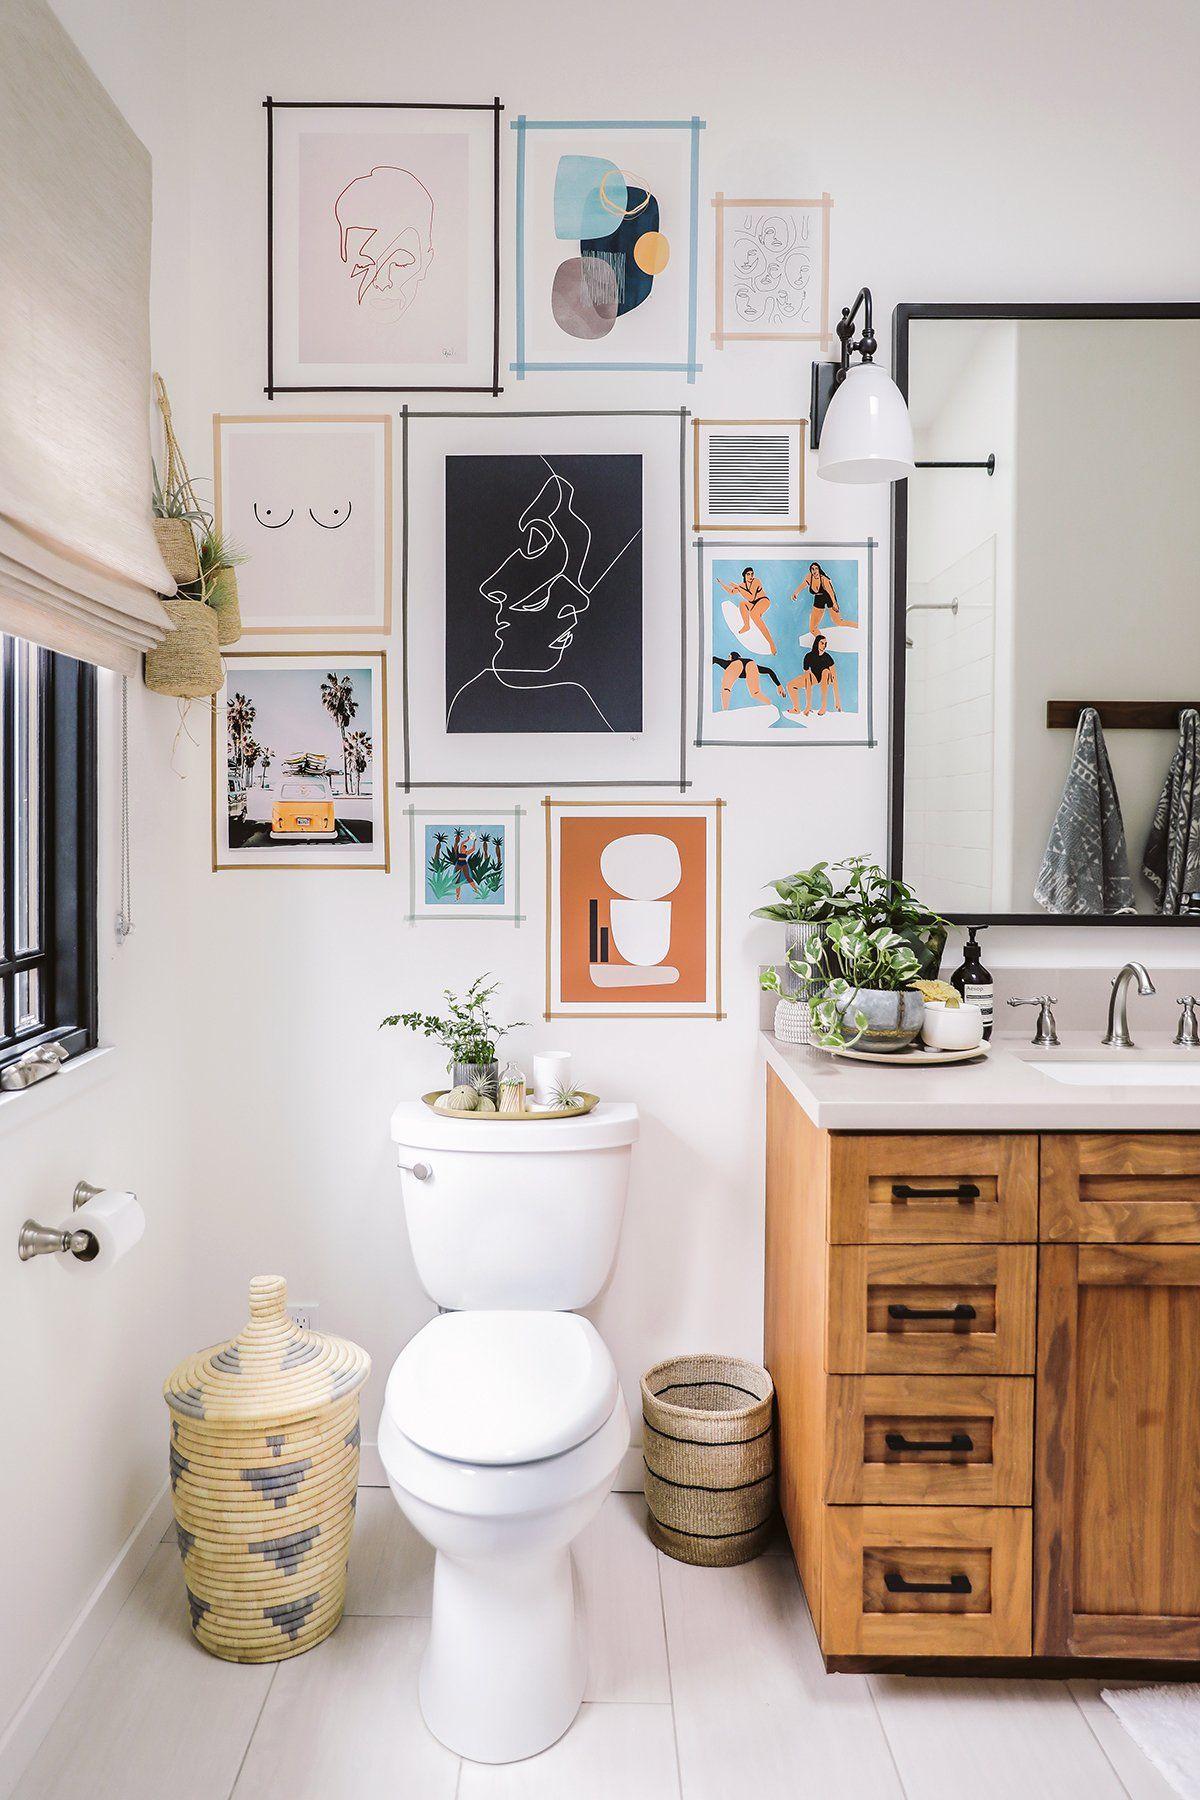 Diy Washi Tape Gallery Wall Small Living Room Decor Bathroom